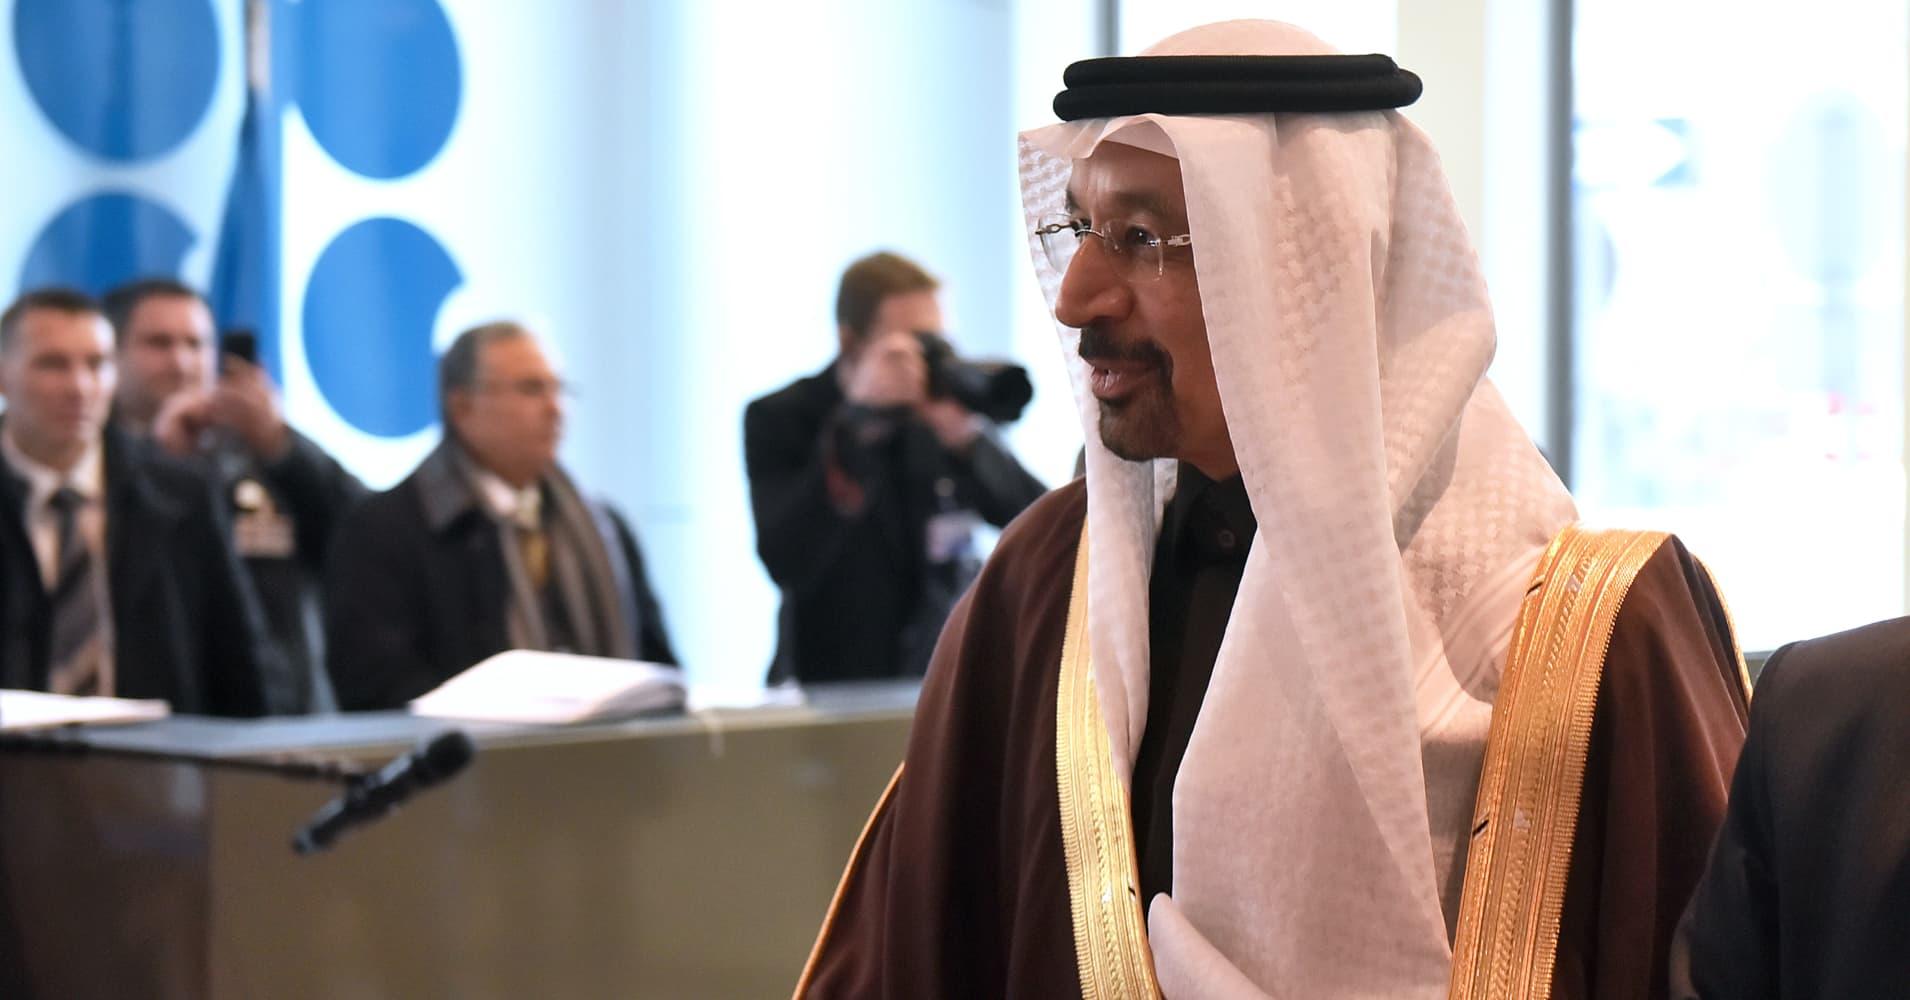 US crude climbs 3.3% to 7-week closing high of $47.89 after Saudis vow to cut exports